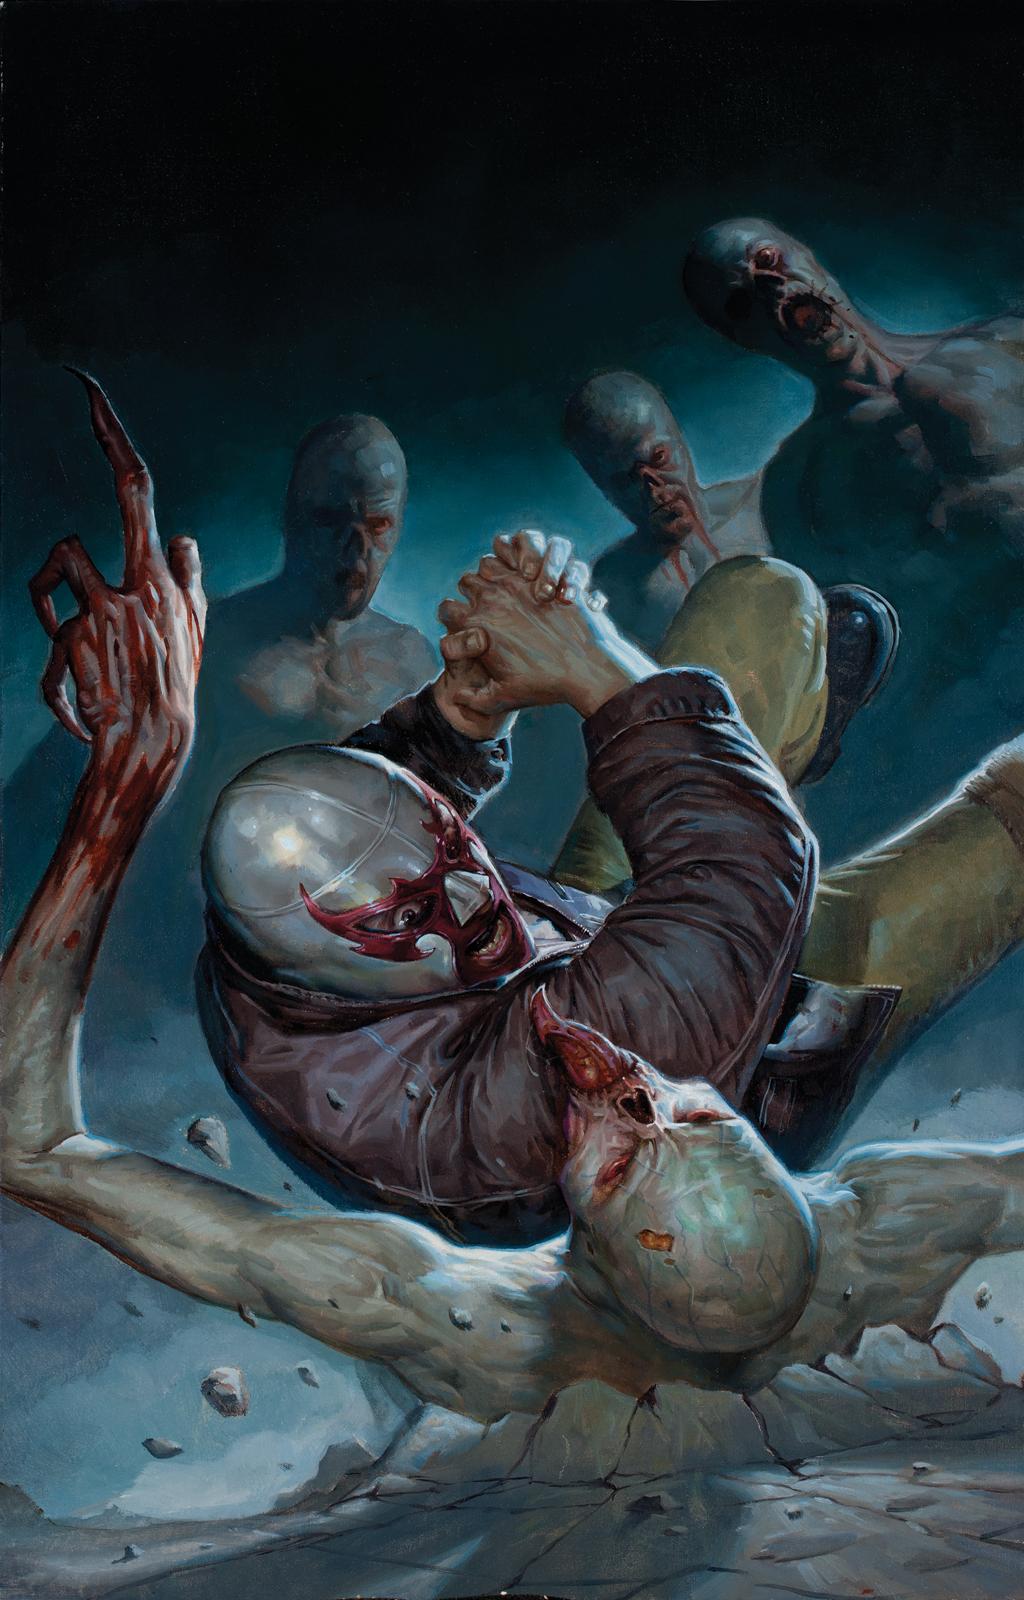 The Dark Fantasy Illustrations of Erik M Gist | E.M. Gist ... | 1024 x 1600 jpeg 1264kB